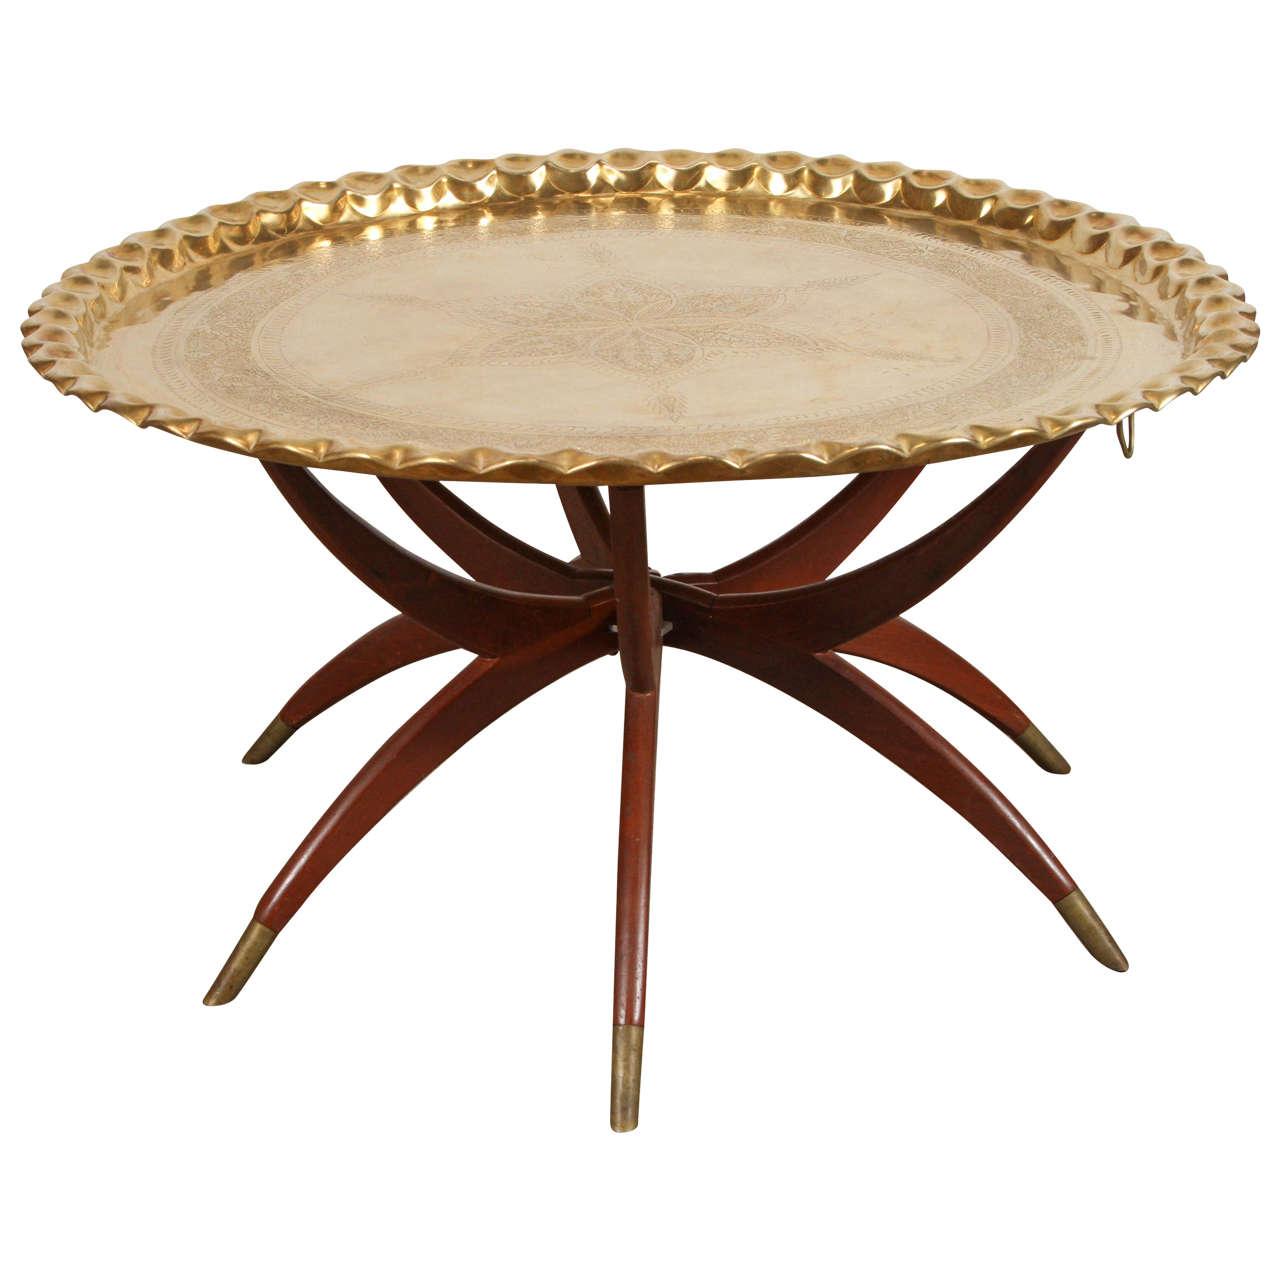 Moroccan Moorish Brass Tray Table On Spider Folding Stand In 2021 Brass Tray Table Brass Tray Tray Table [ 1280 x 1280 Pixel ]